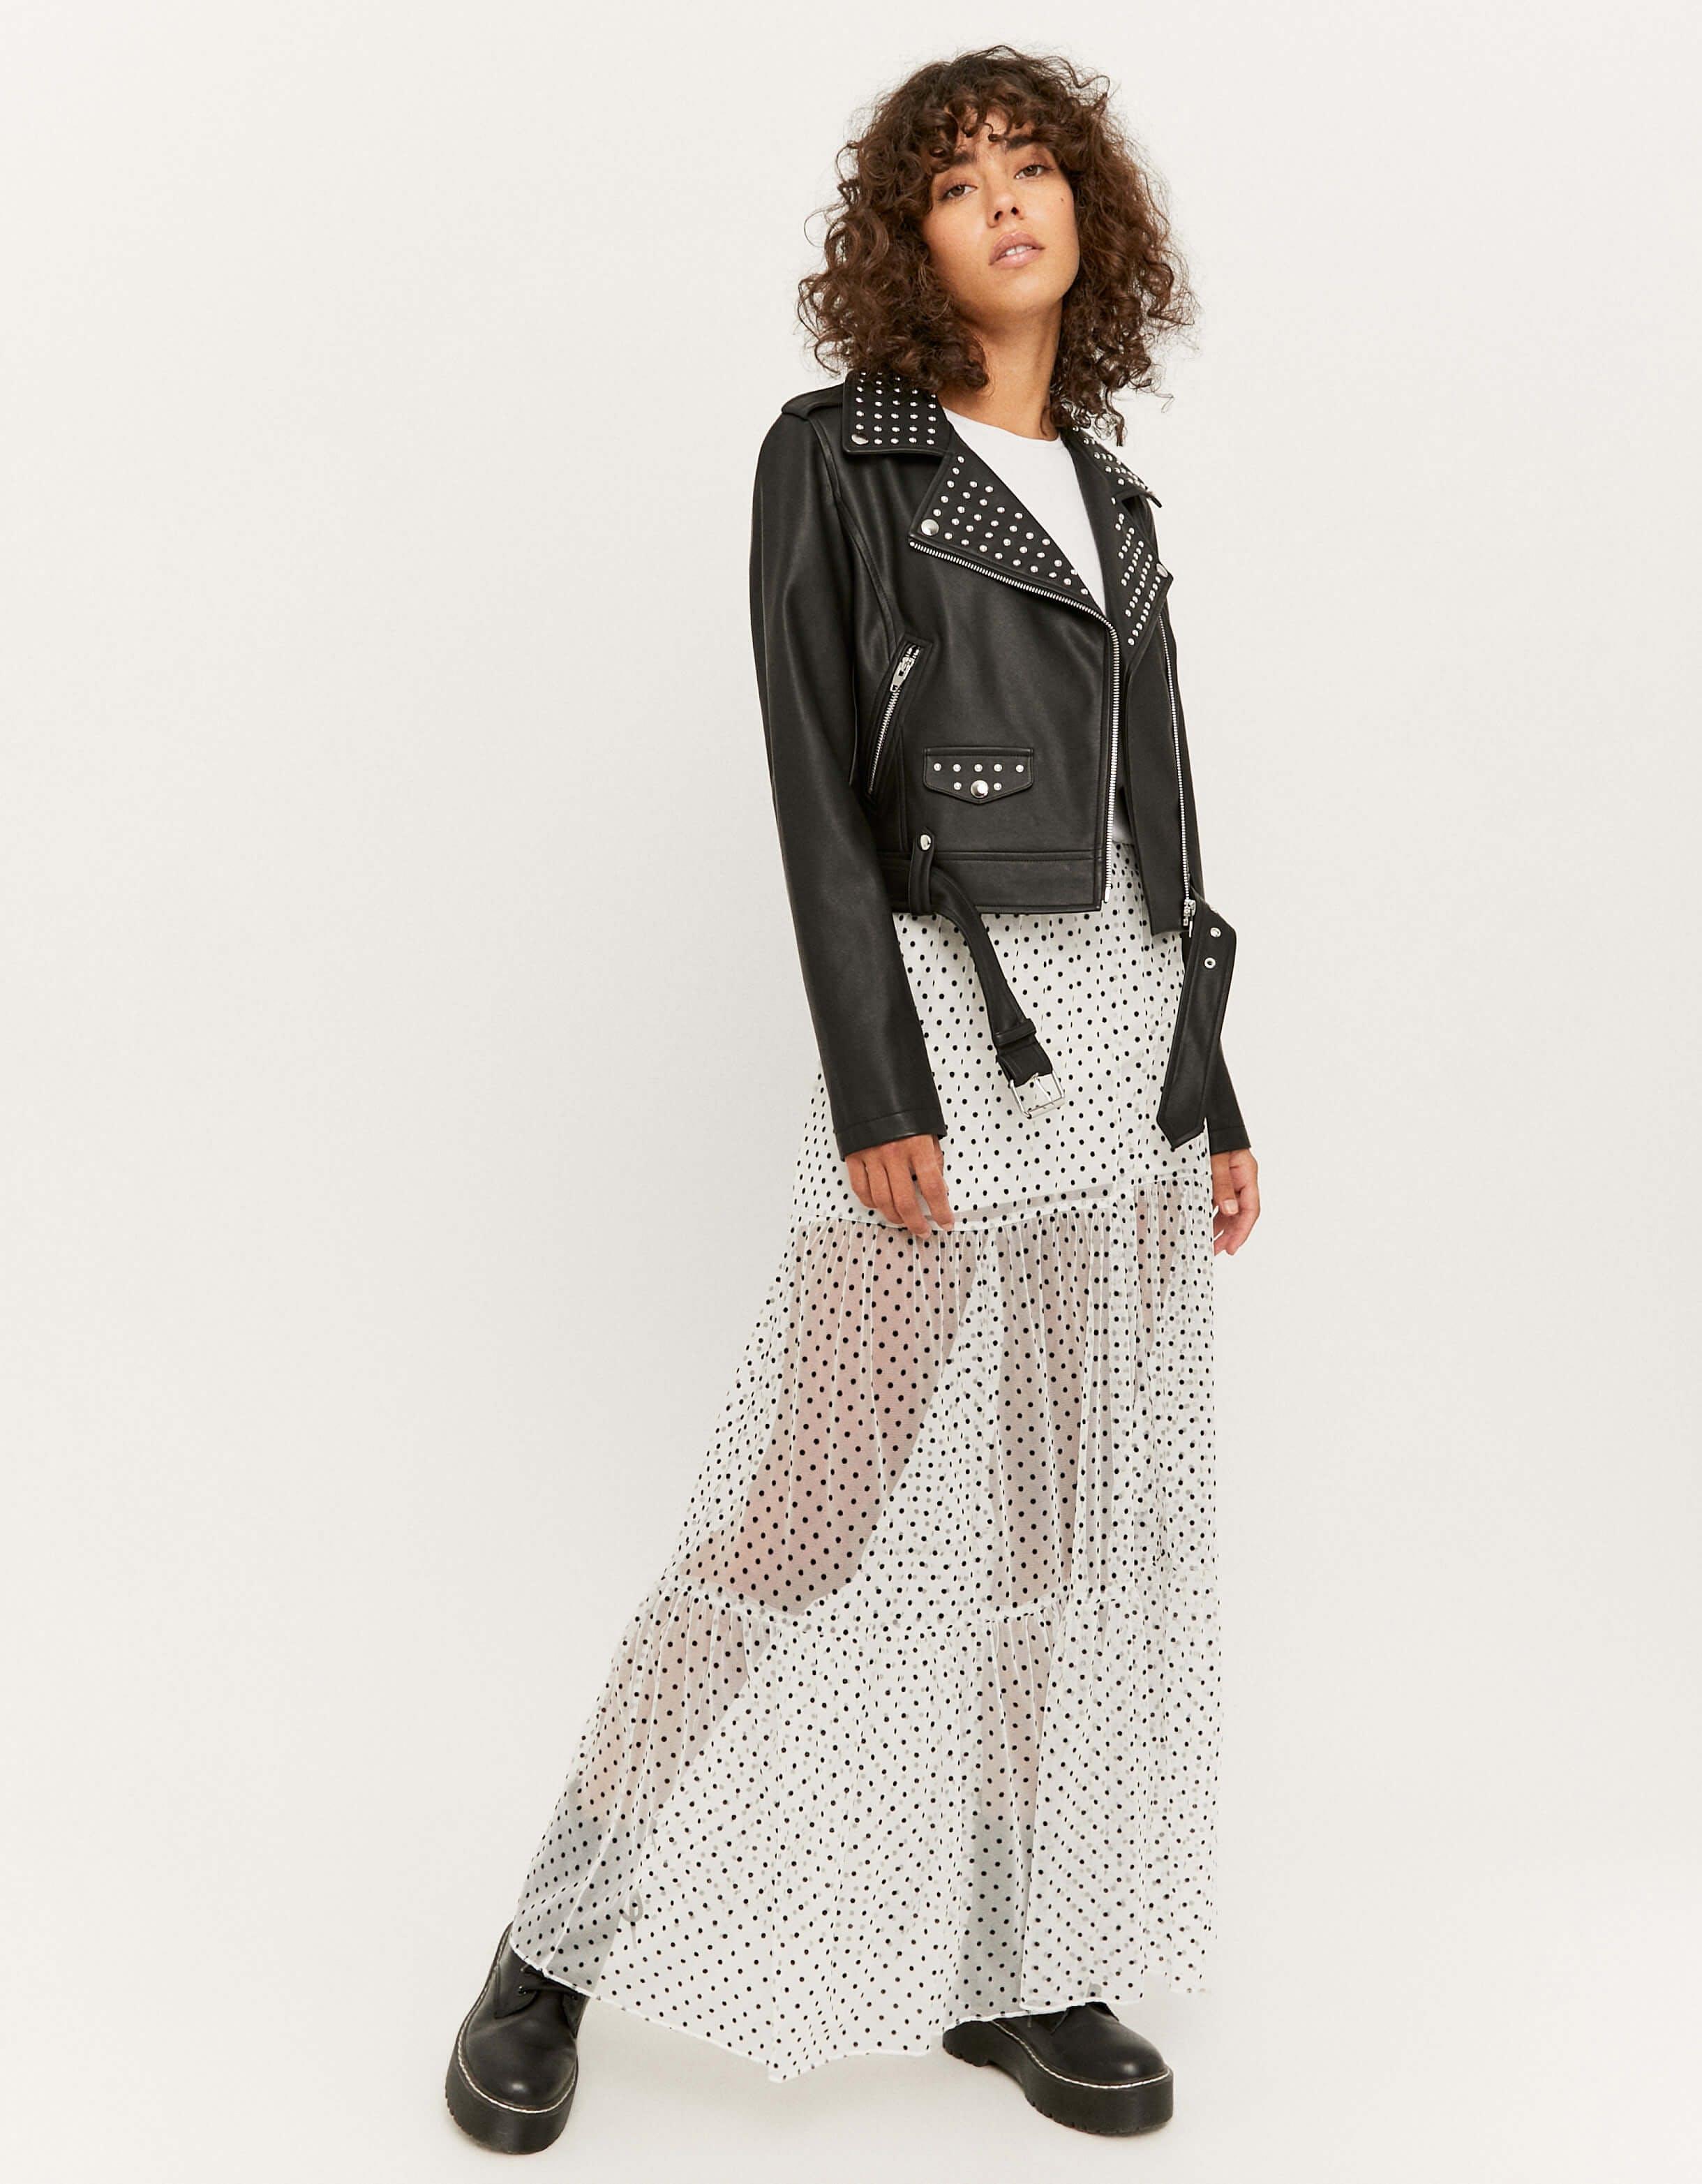 Midi & Maxi Skirts